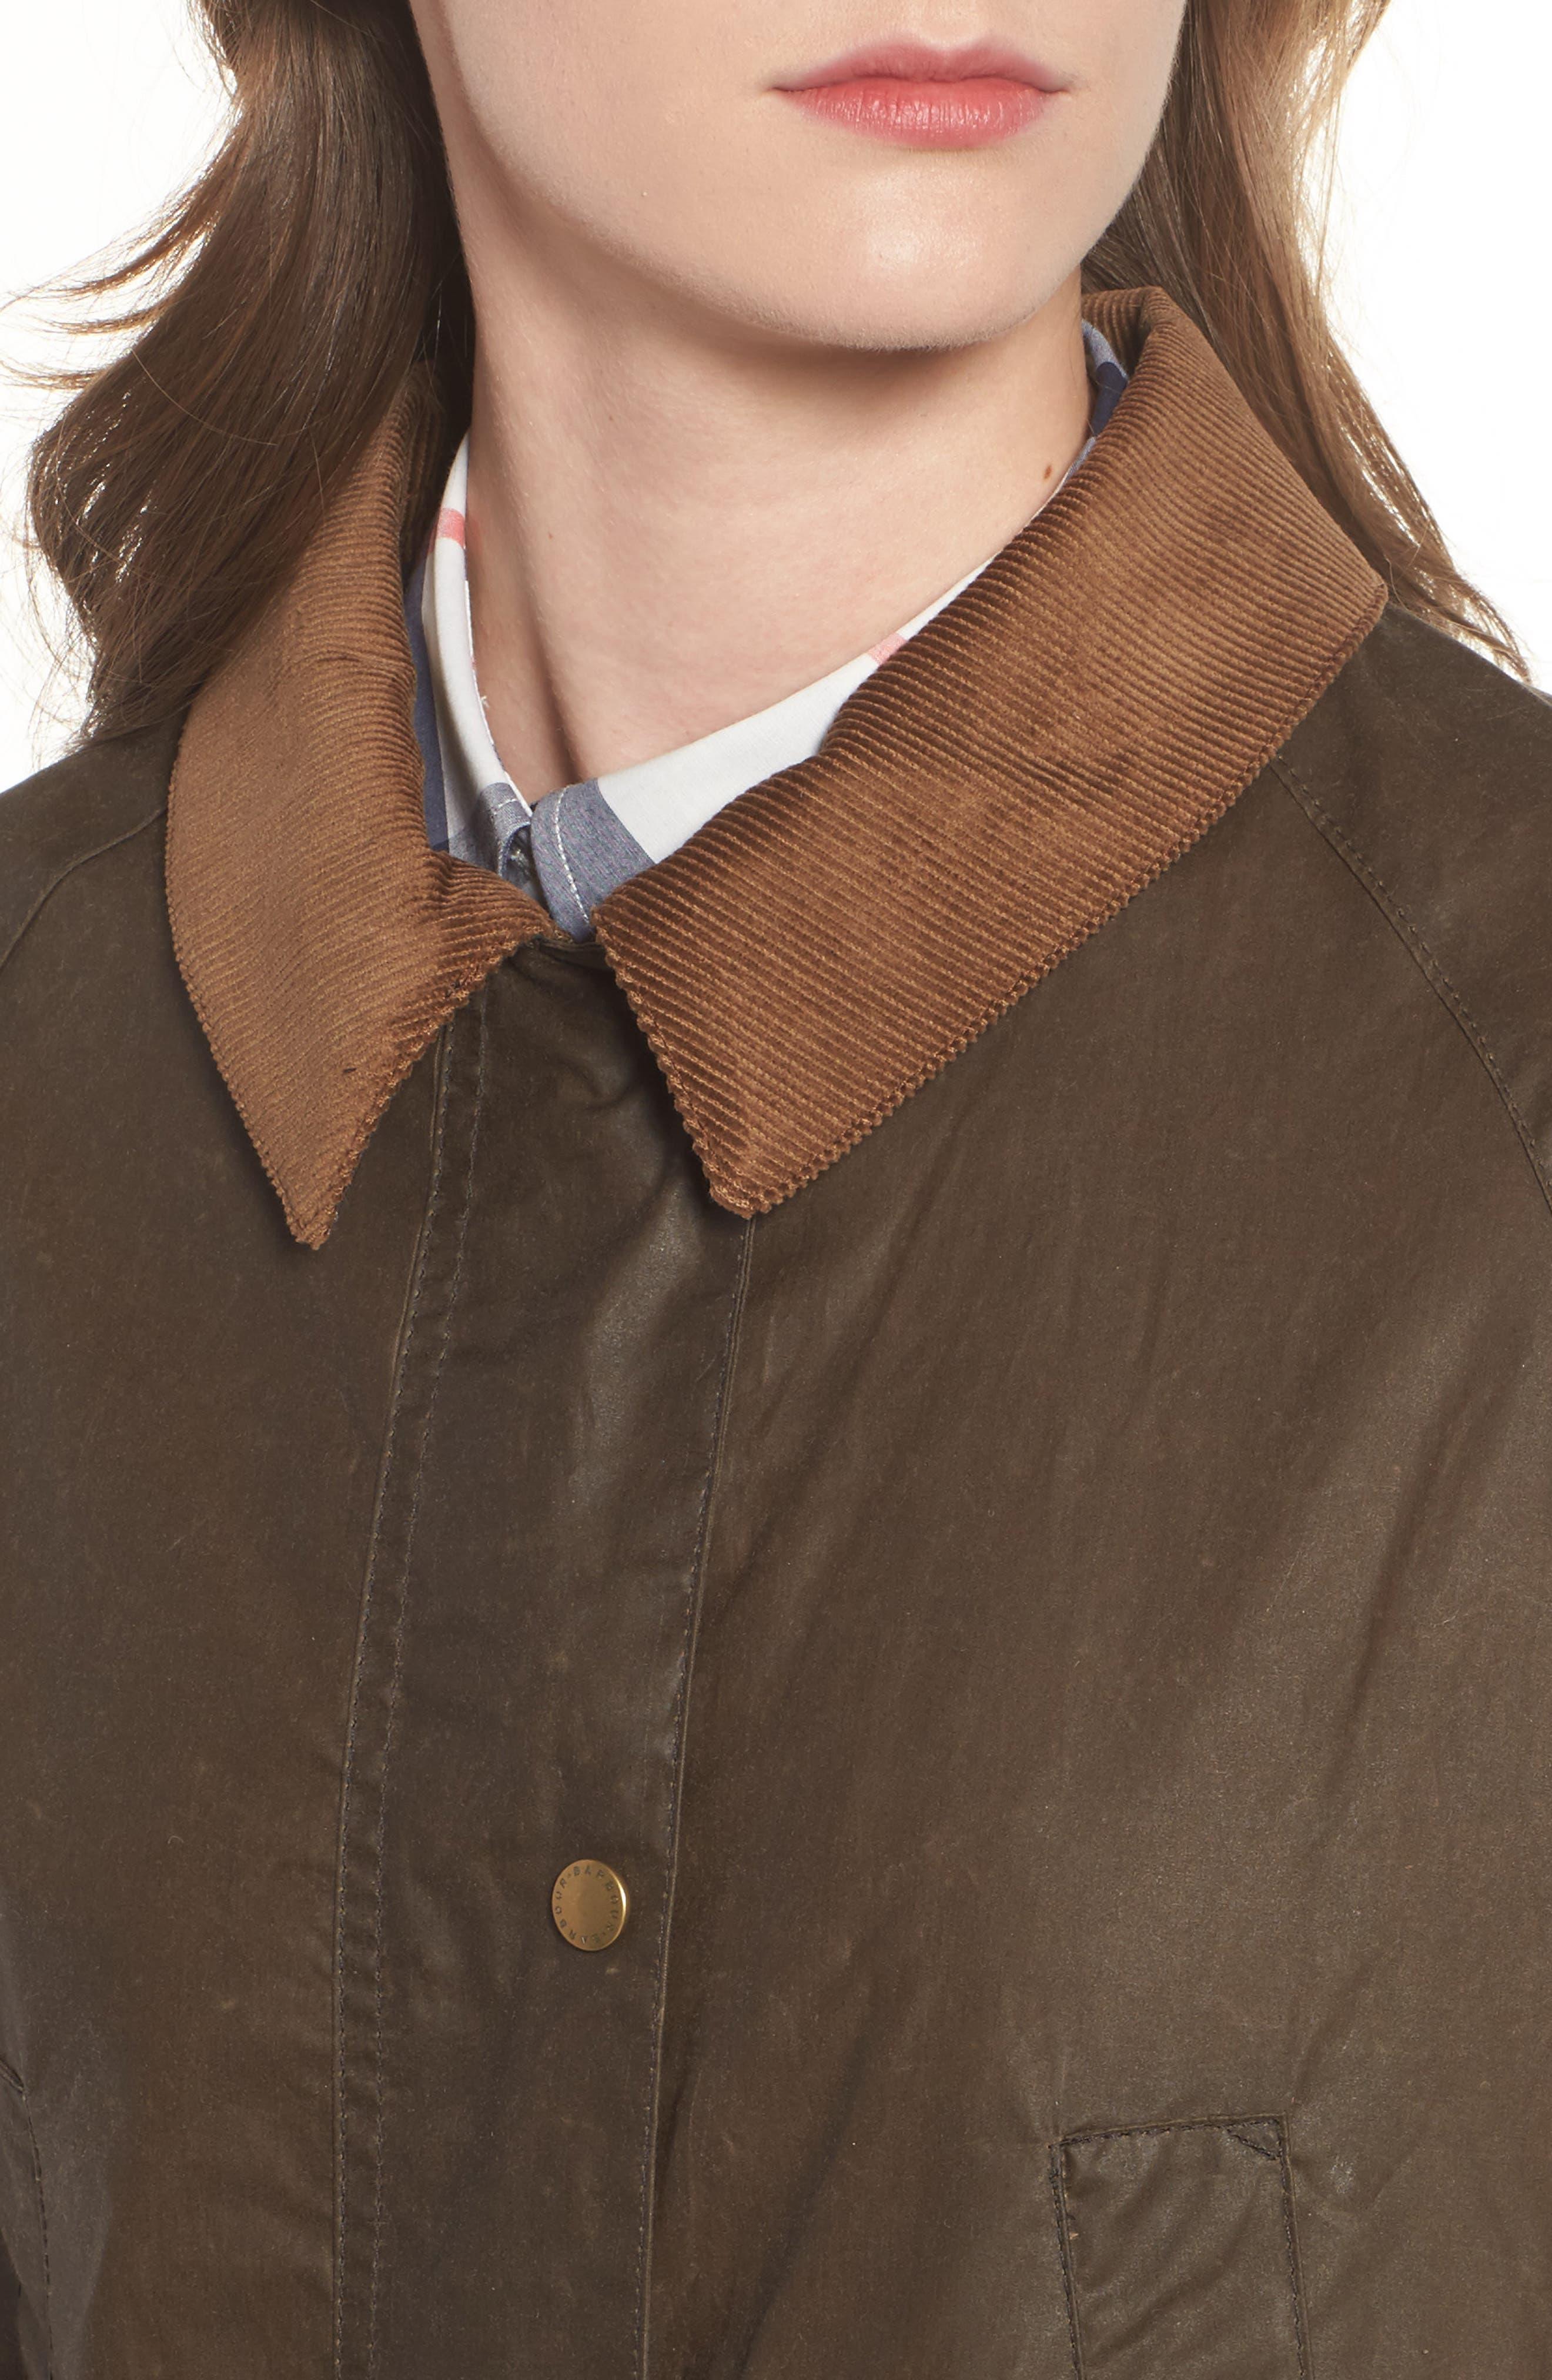 Acorn Water Resistant Waxed Cotton Jacket,                             Alternate thumbnail 4, color,                             230